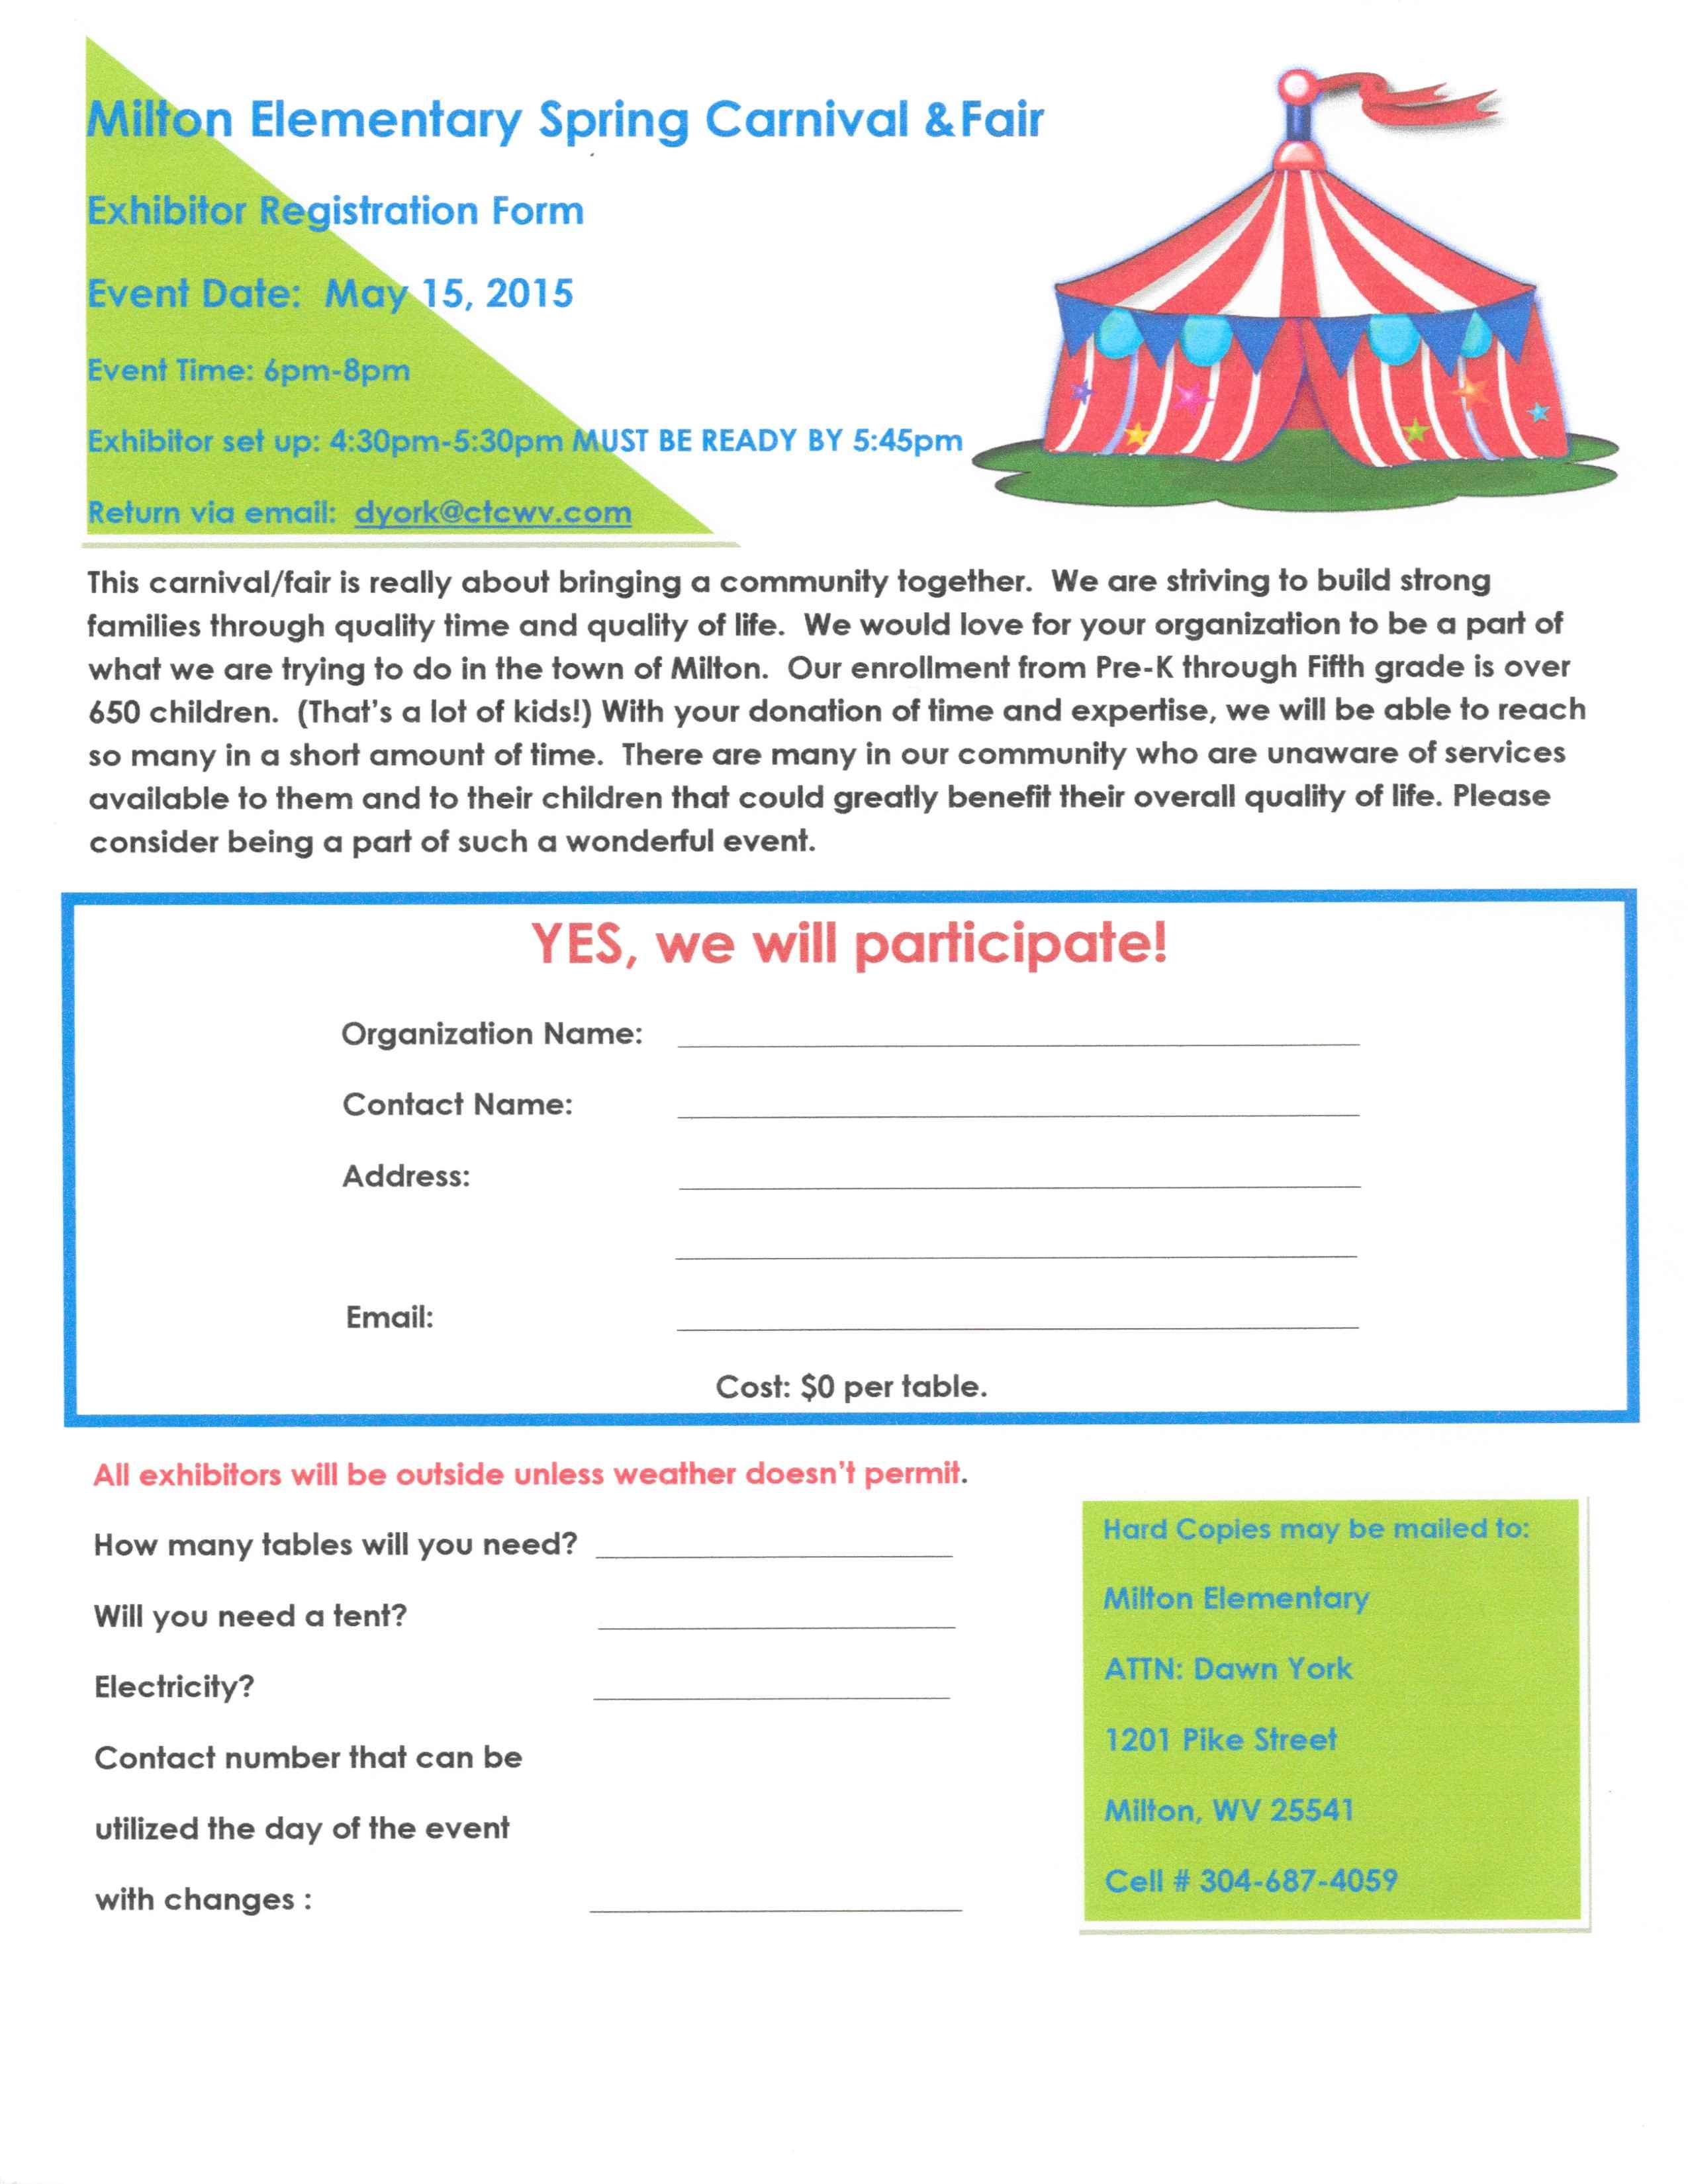 Milton Elem Carnival 5-15-15 Jpeg